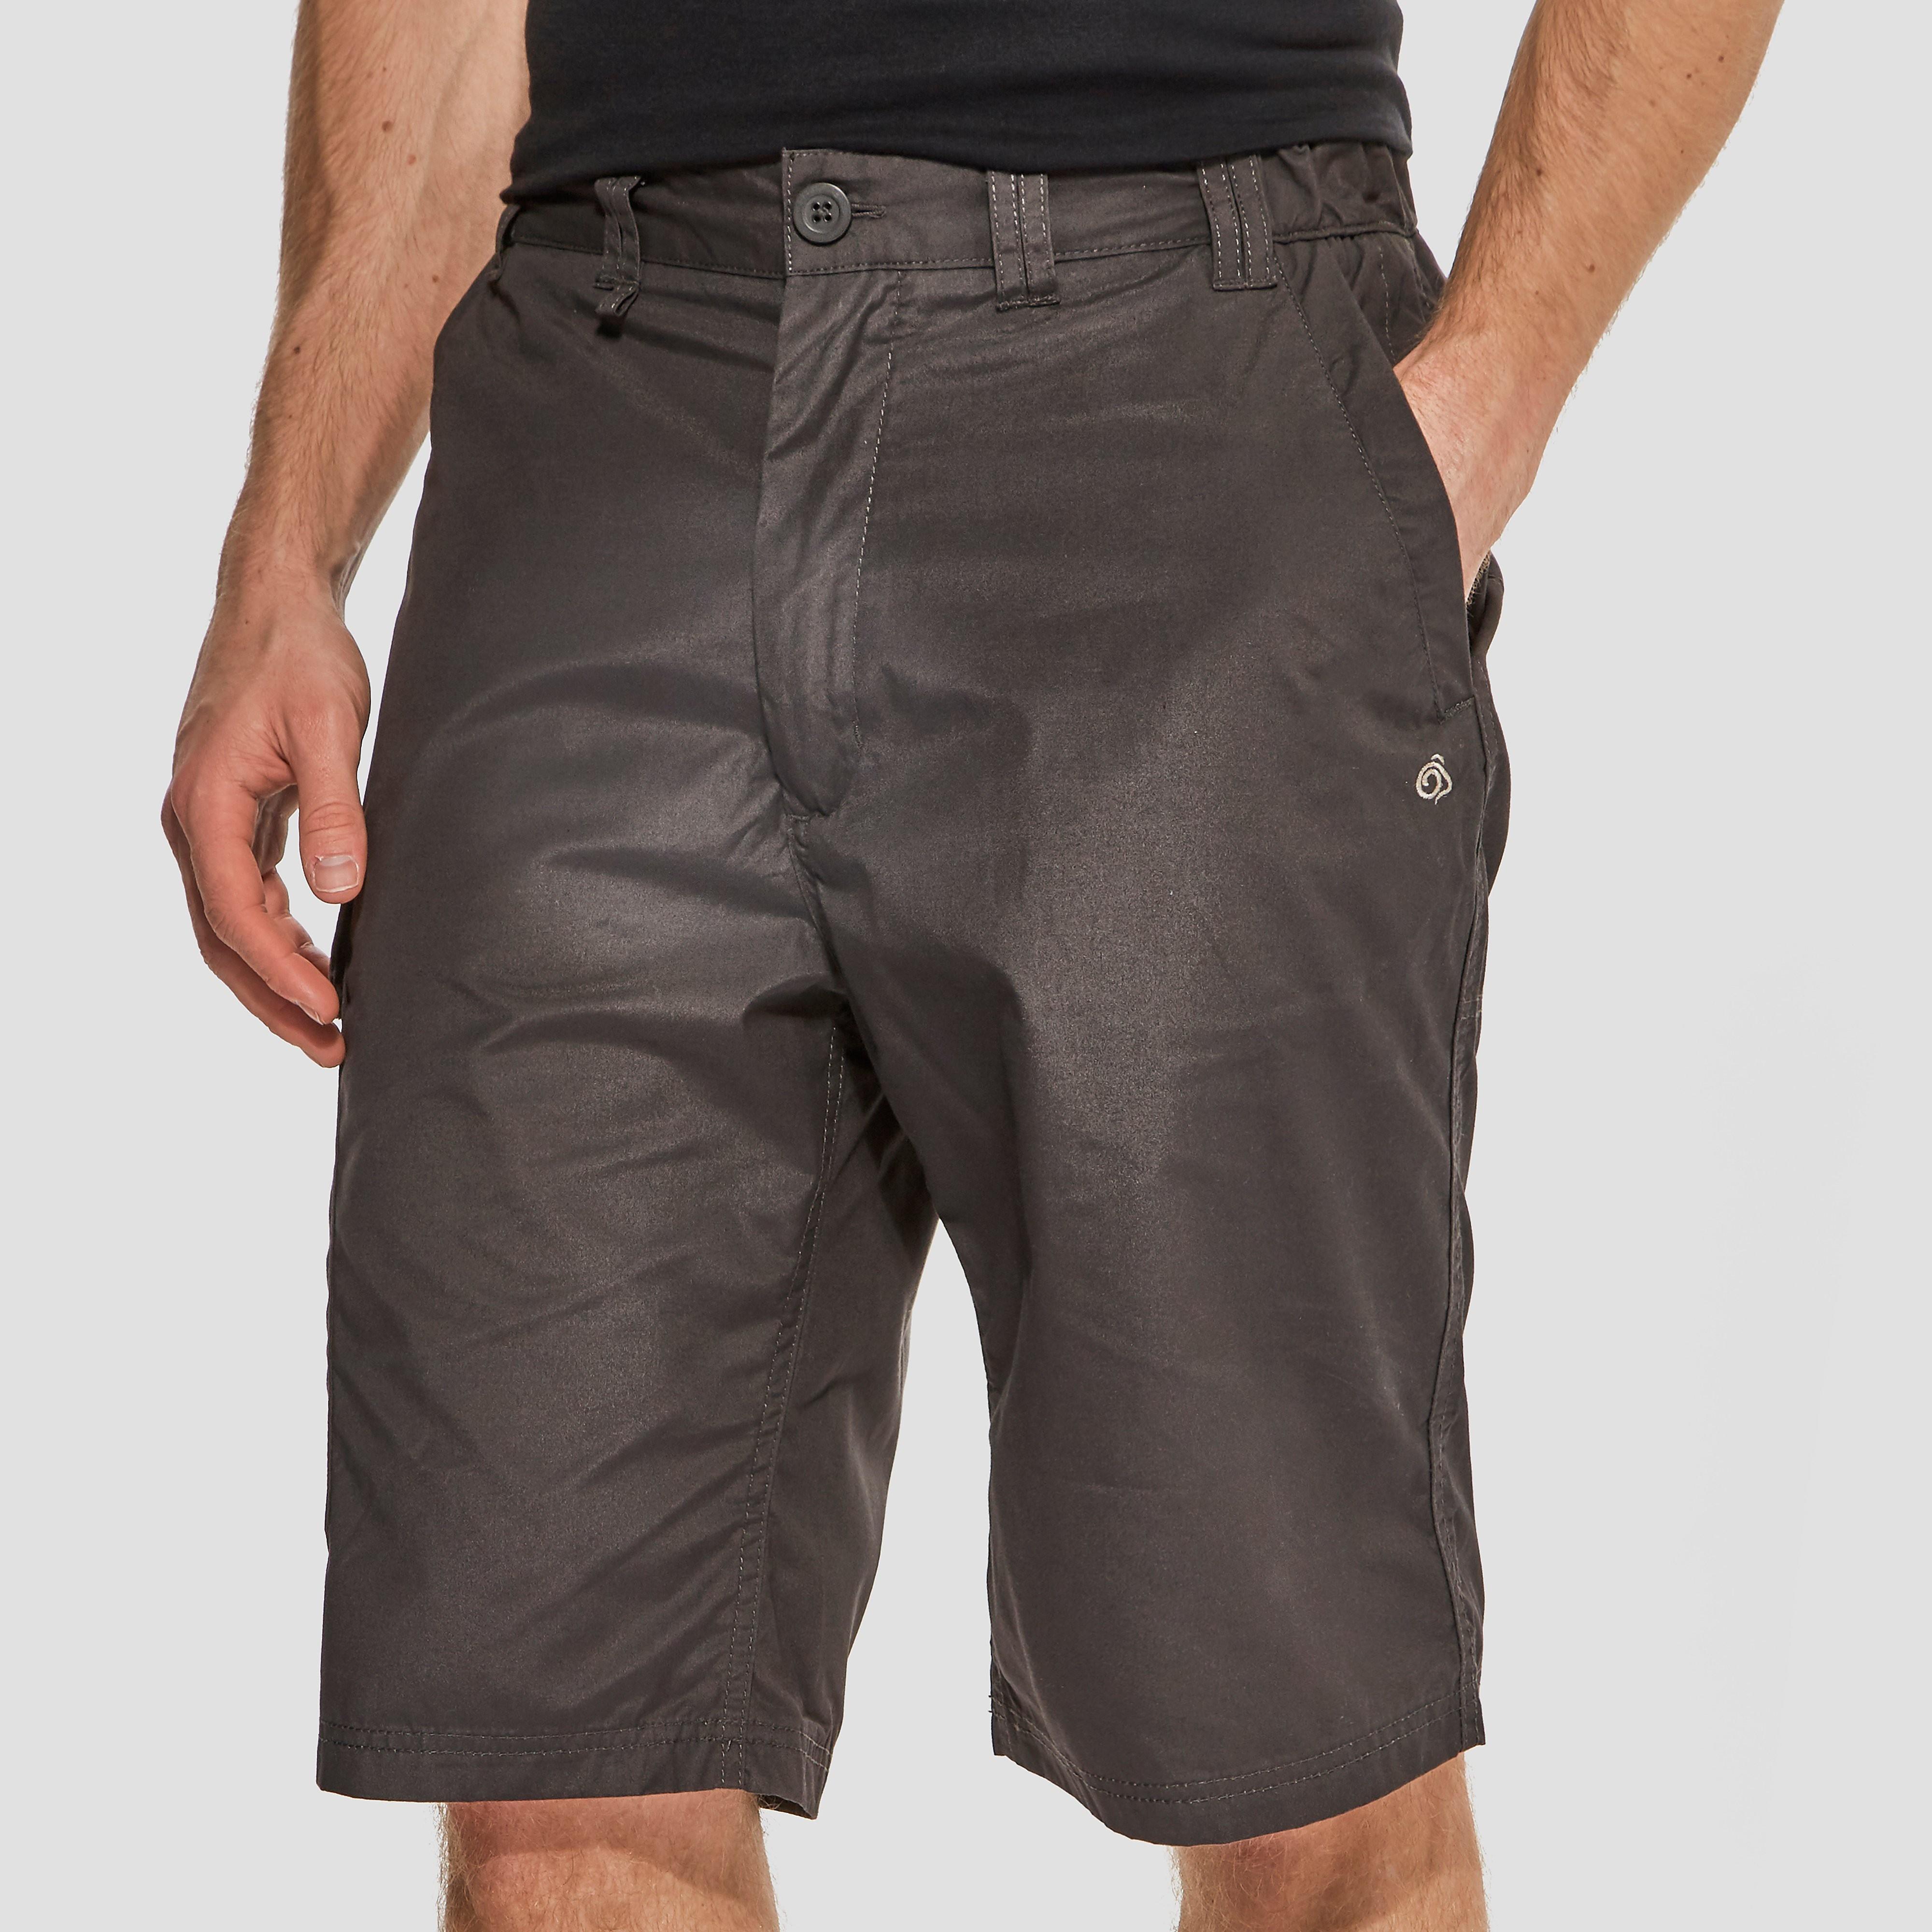 Craghoppers Kiwi Pro Men's Shorts